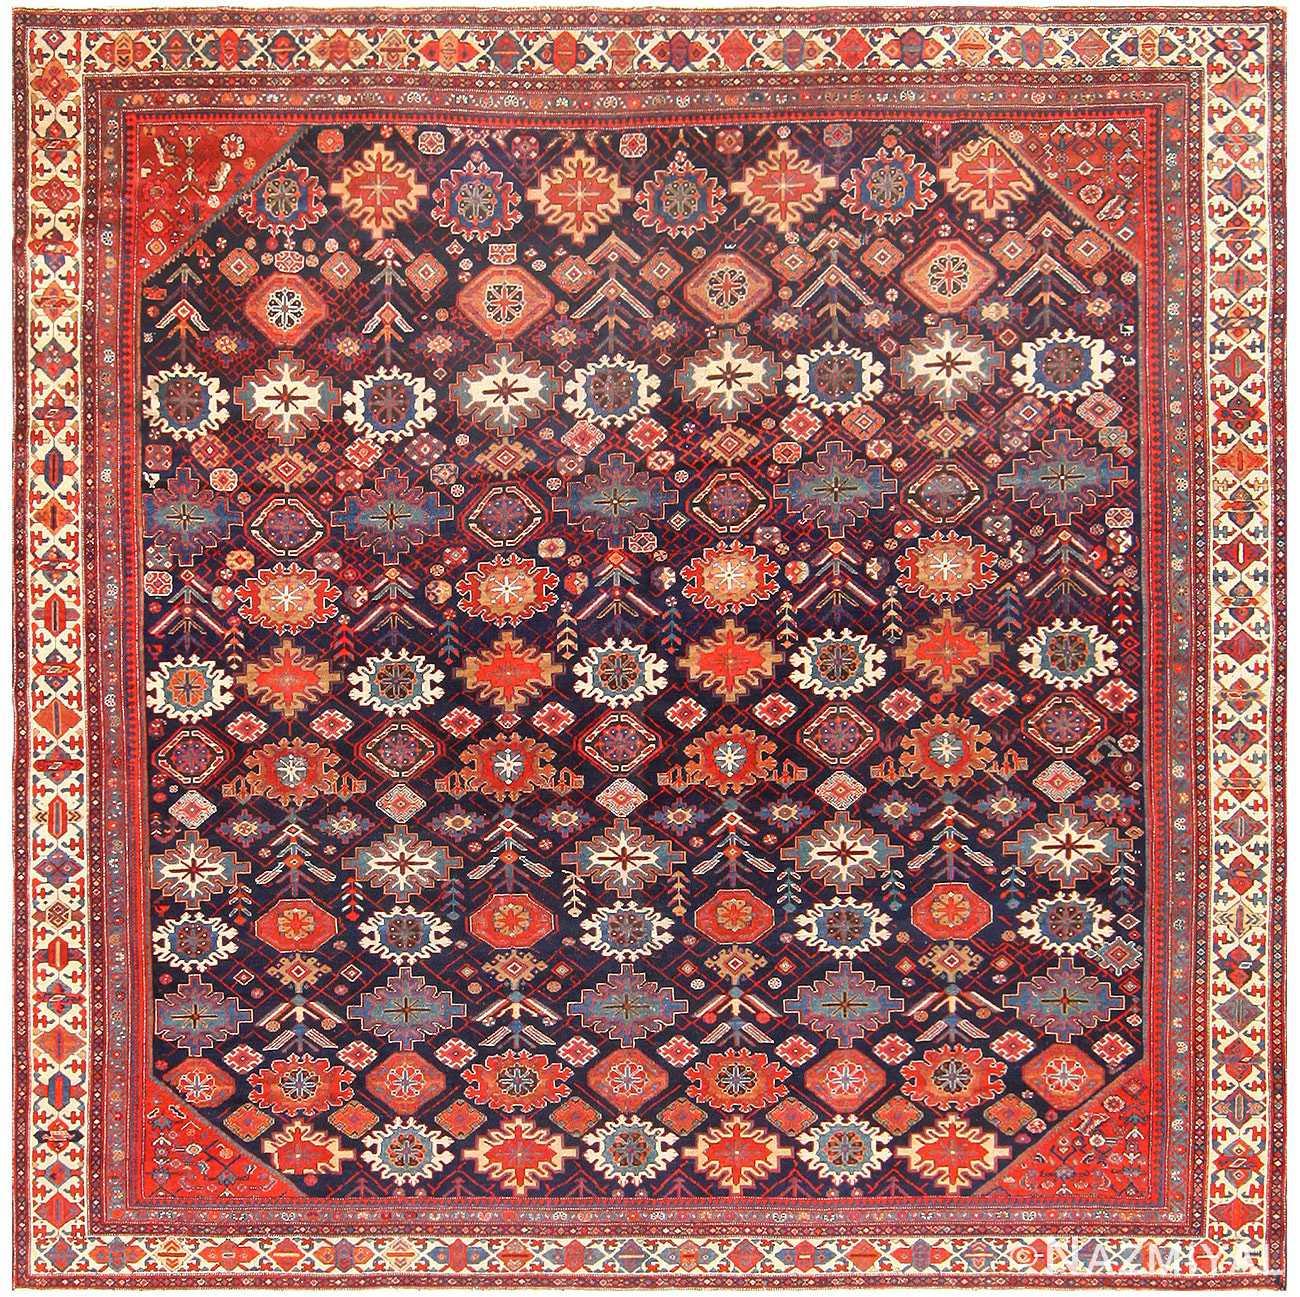 Square Antique Malayer Persian Carpet 48467 By Nazmiyal